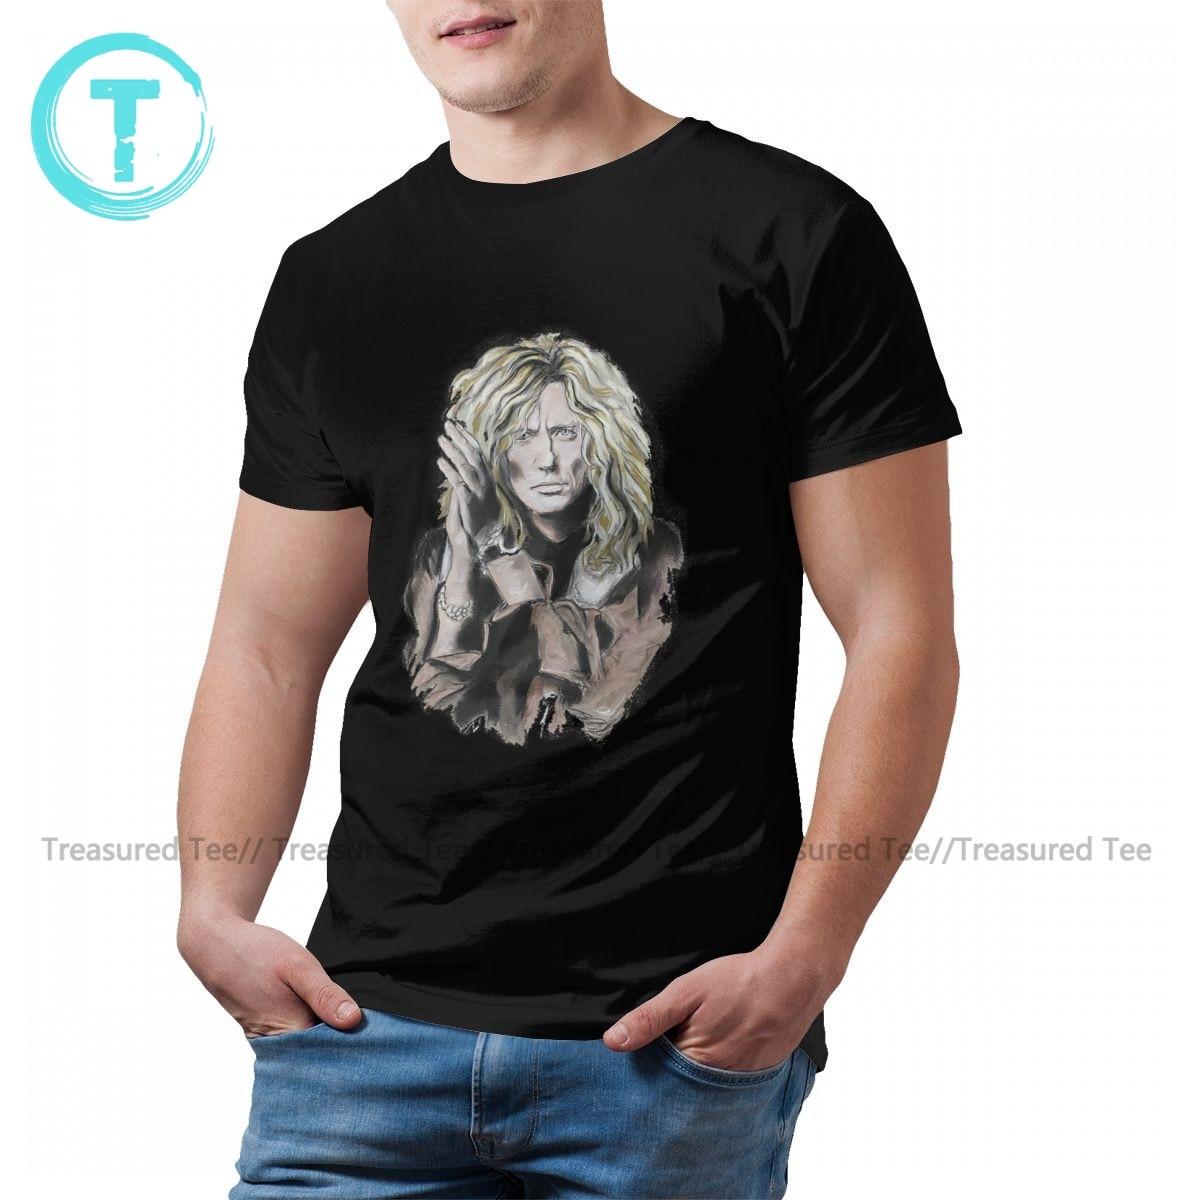 Whitesnake T Shirt Funny Cotton Summer T-Shirt Short Sleeve Print Tshirt 5XL Man